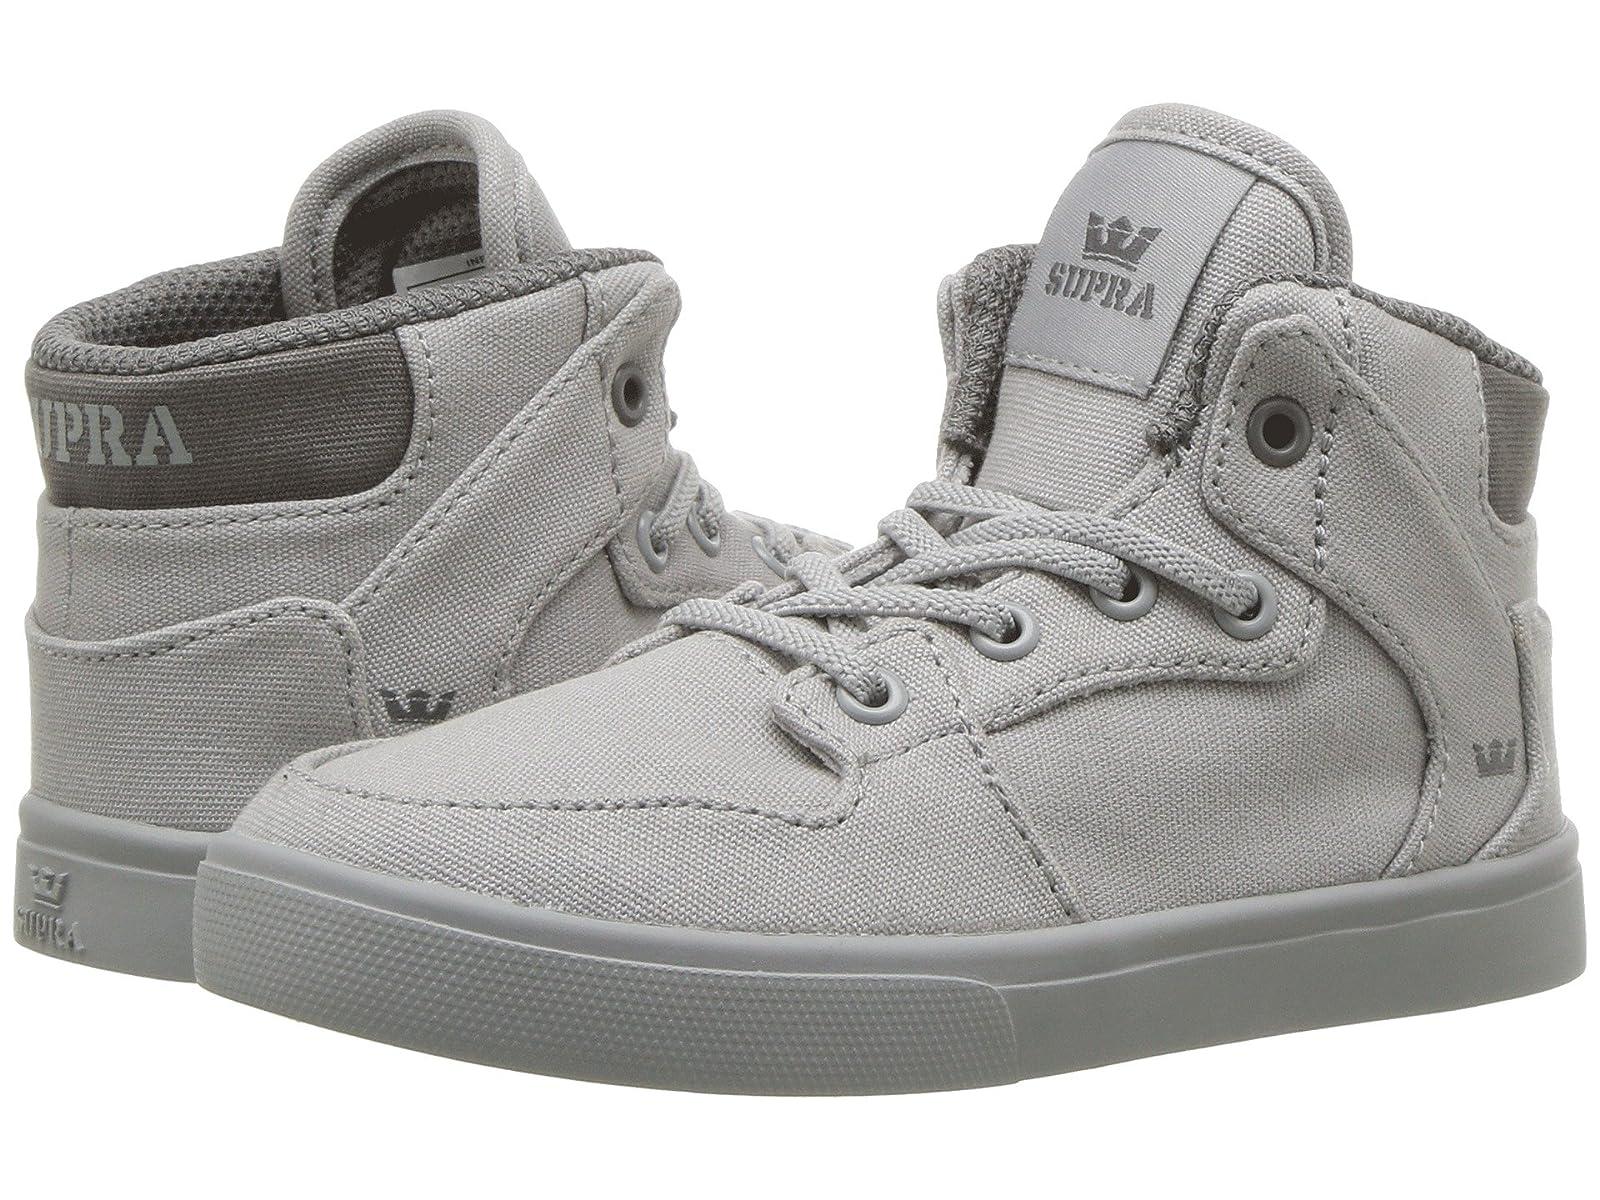 Supra Kids Vaider (Toddler)Atmospheric grades have affordable shoes